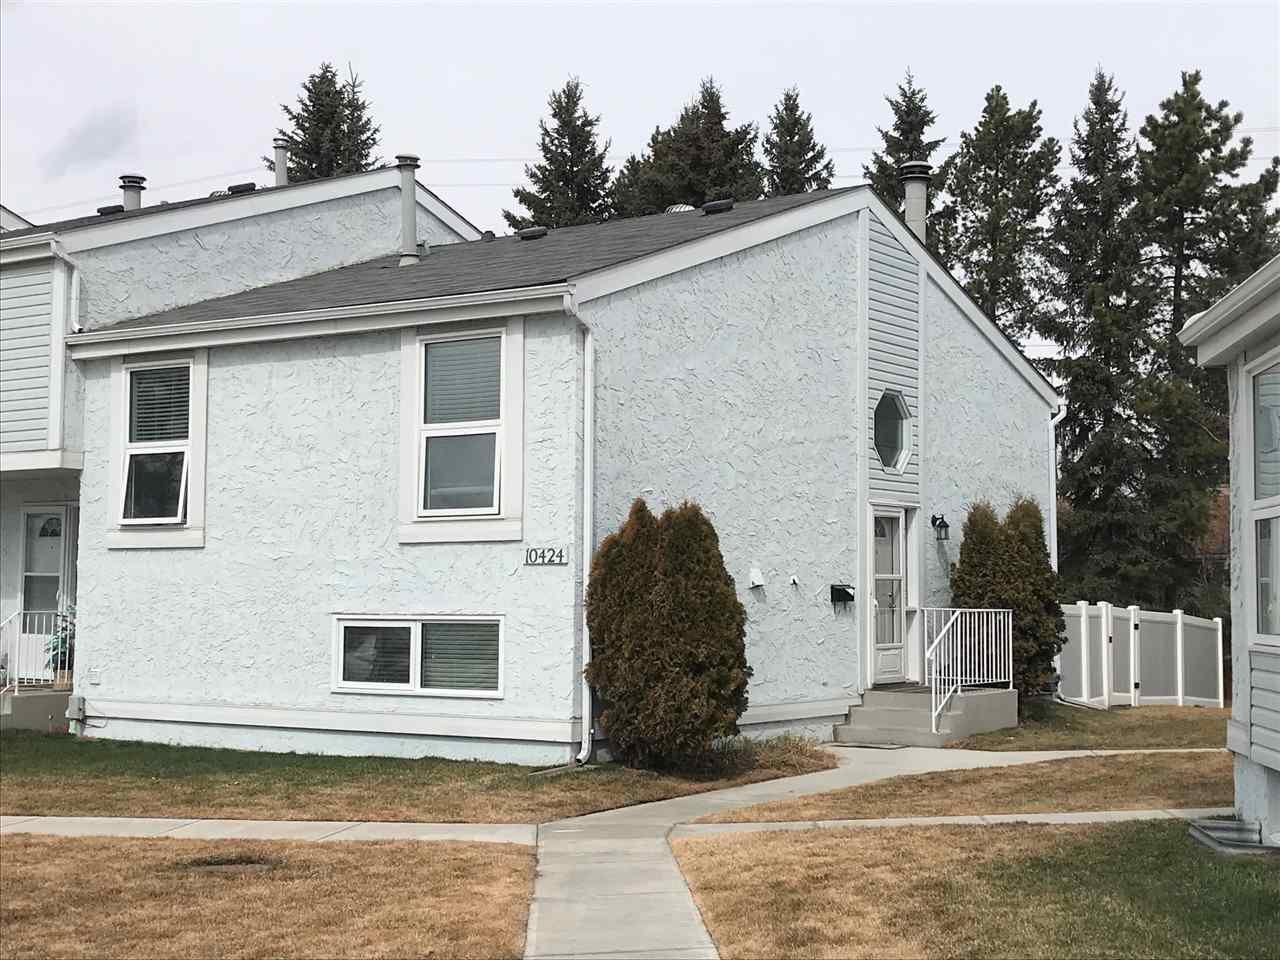 Main Photo: 10424 28A Avenue in Edmonton: Zone 16 Townhouse for sale : MLS®# E4152233